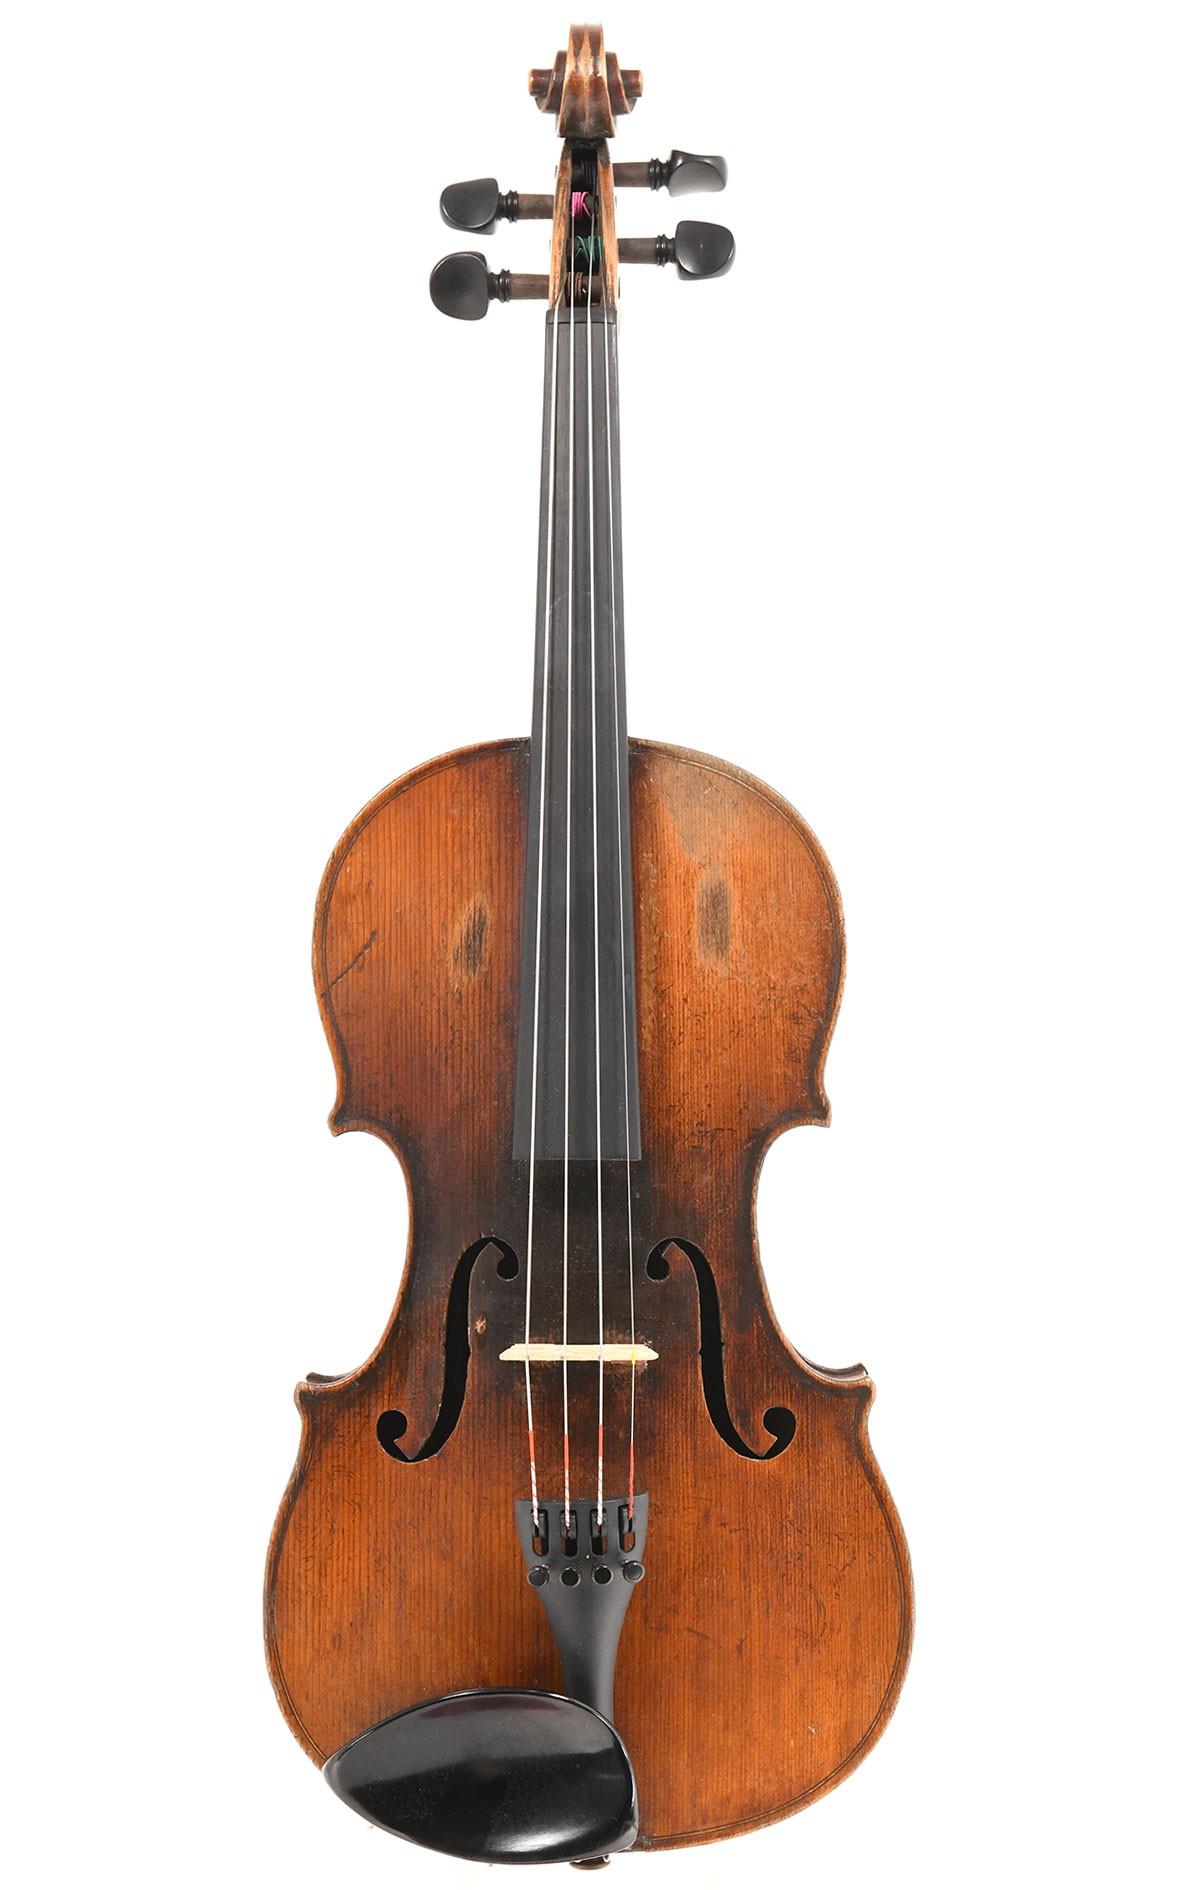 Atelier Laberte: antique French violin around 1910